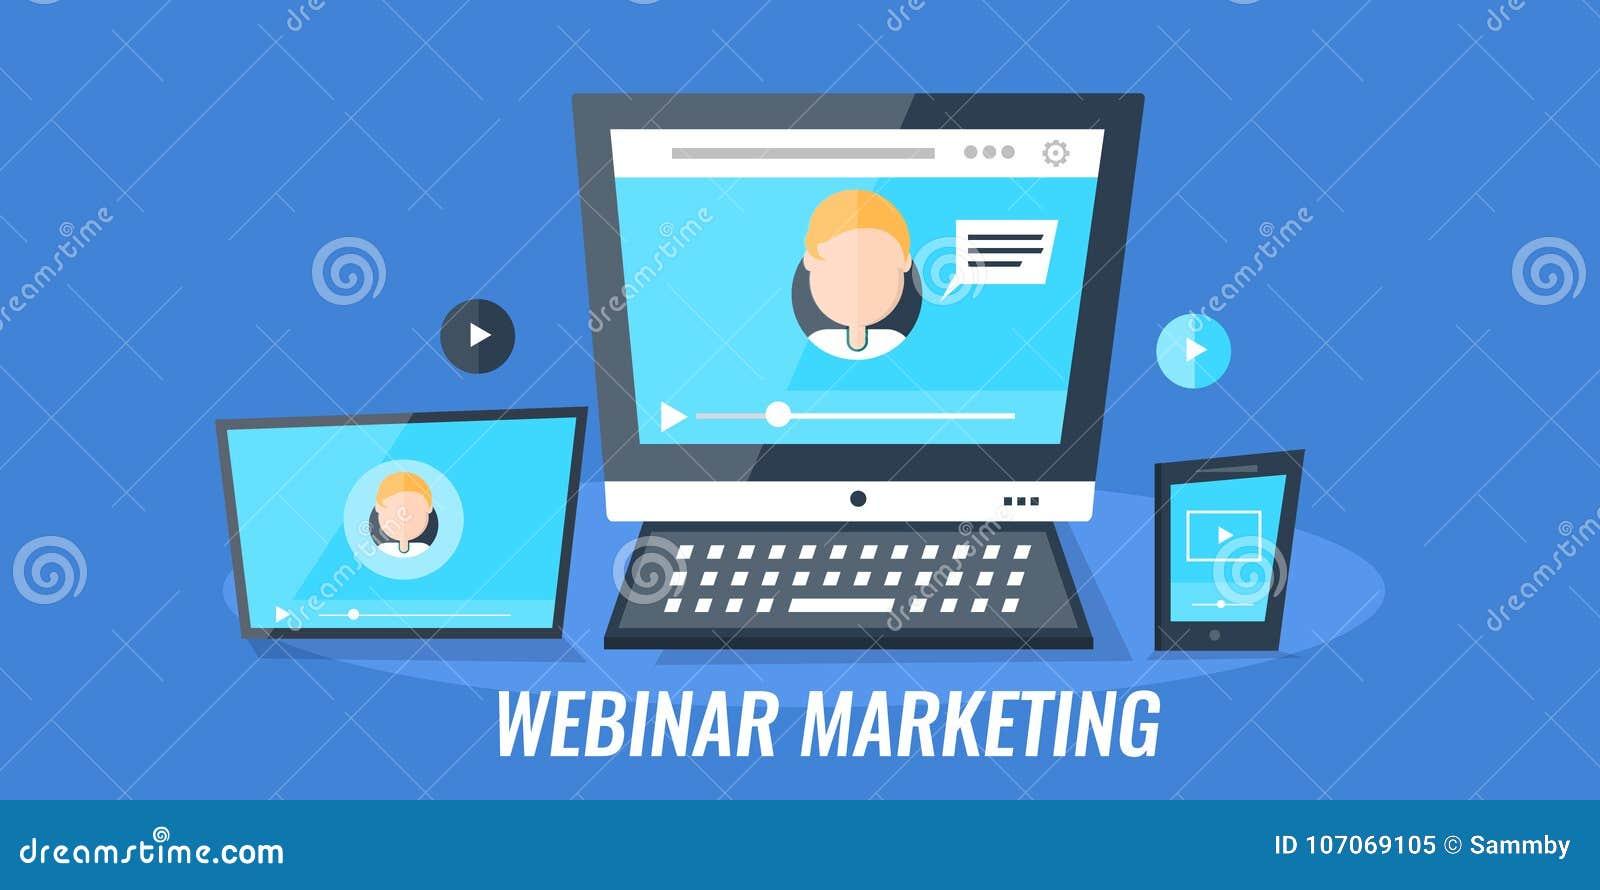 Webinar marketing - videoconfereren - Webseminarie over digitale media apparaten Vlakke ontwerp vector marketing banner